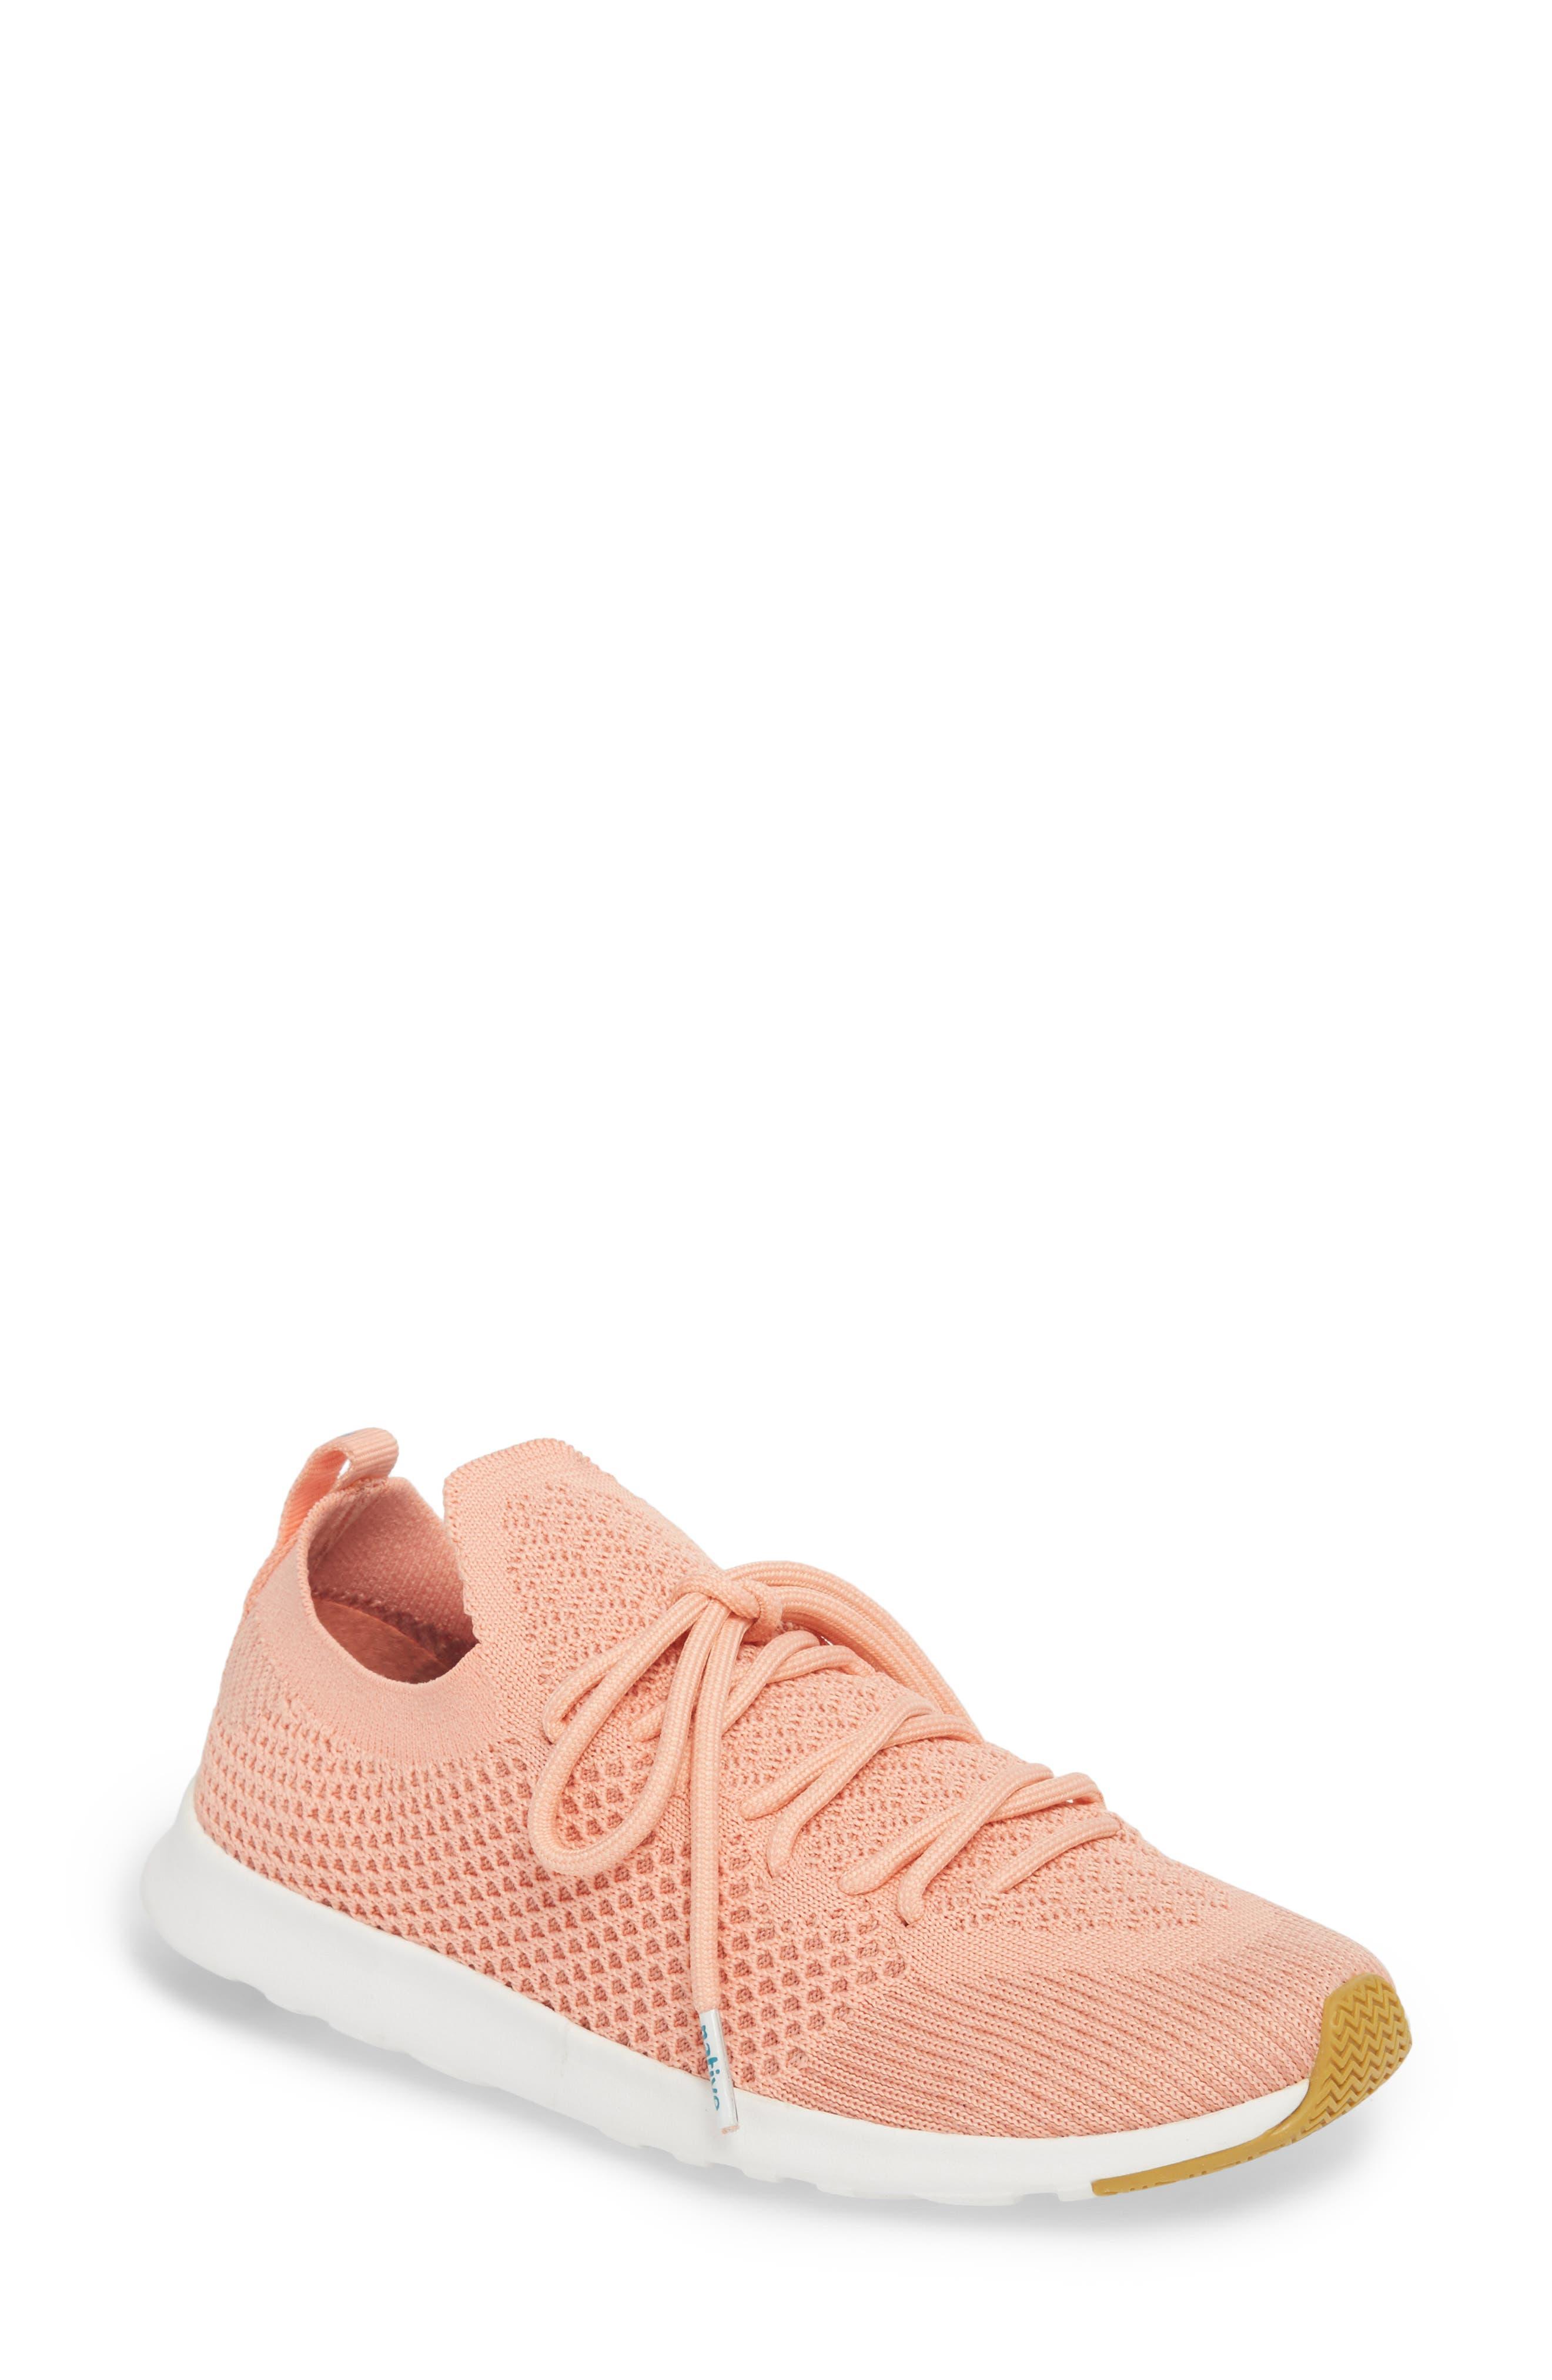 AP Mercury Liteknit Sneaker,                             Main thumbnail 1, color,                             Clay Pink/ Shell White